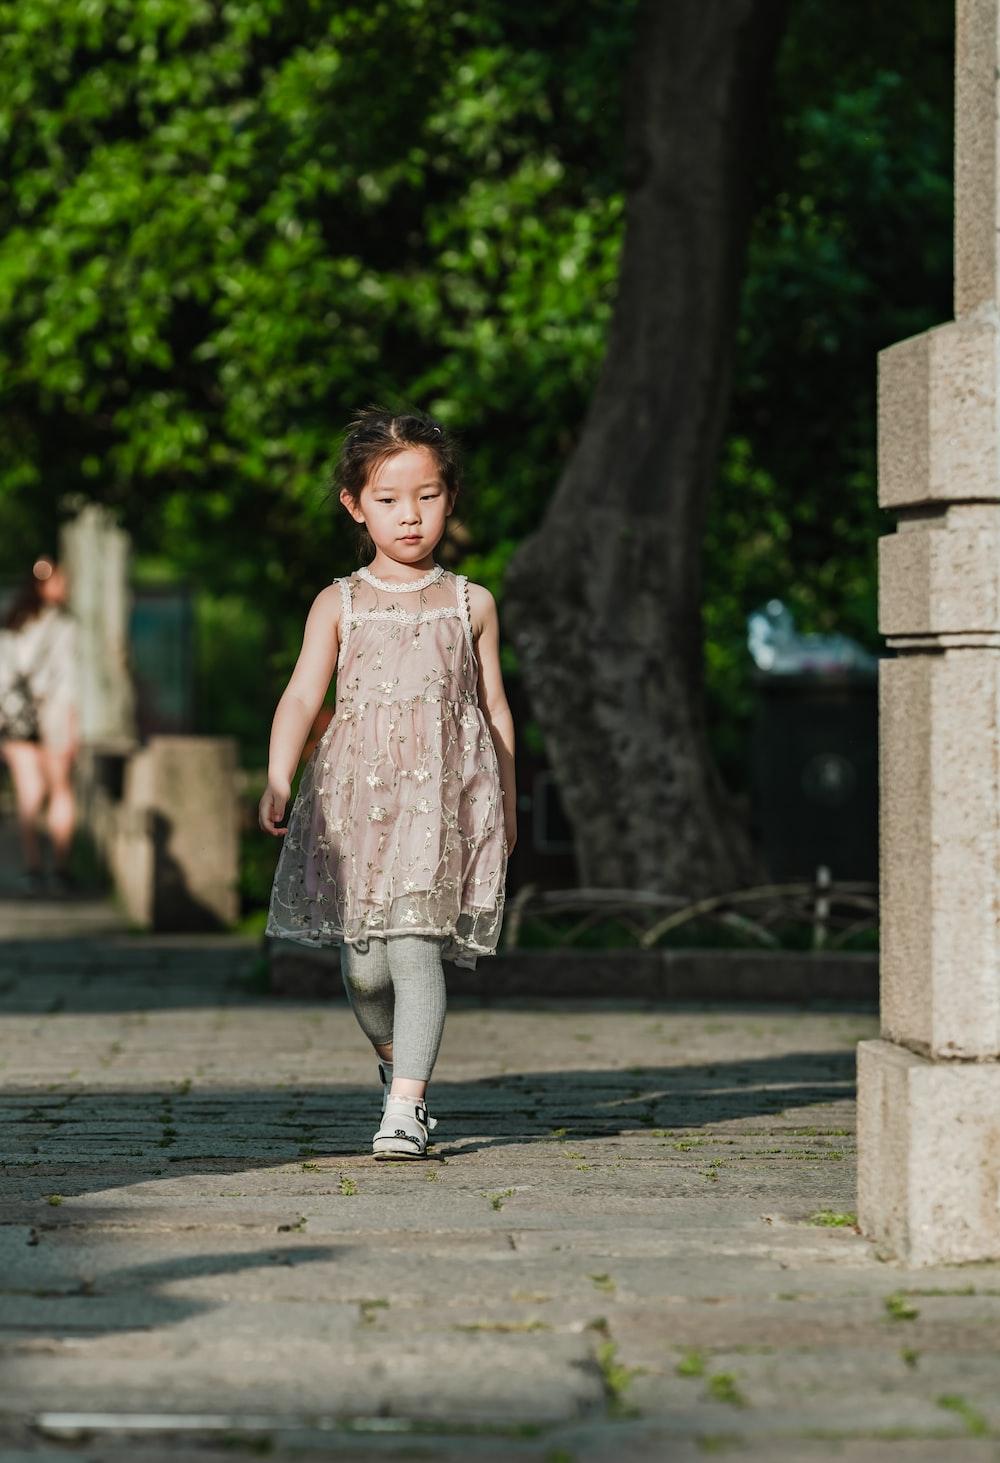 girl walking on concrete pathway near tree